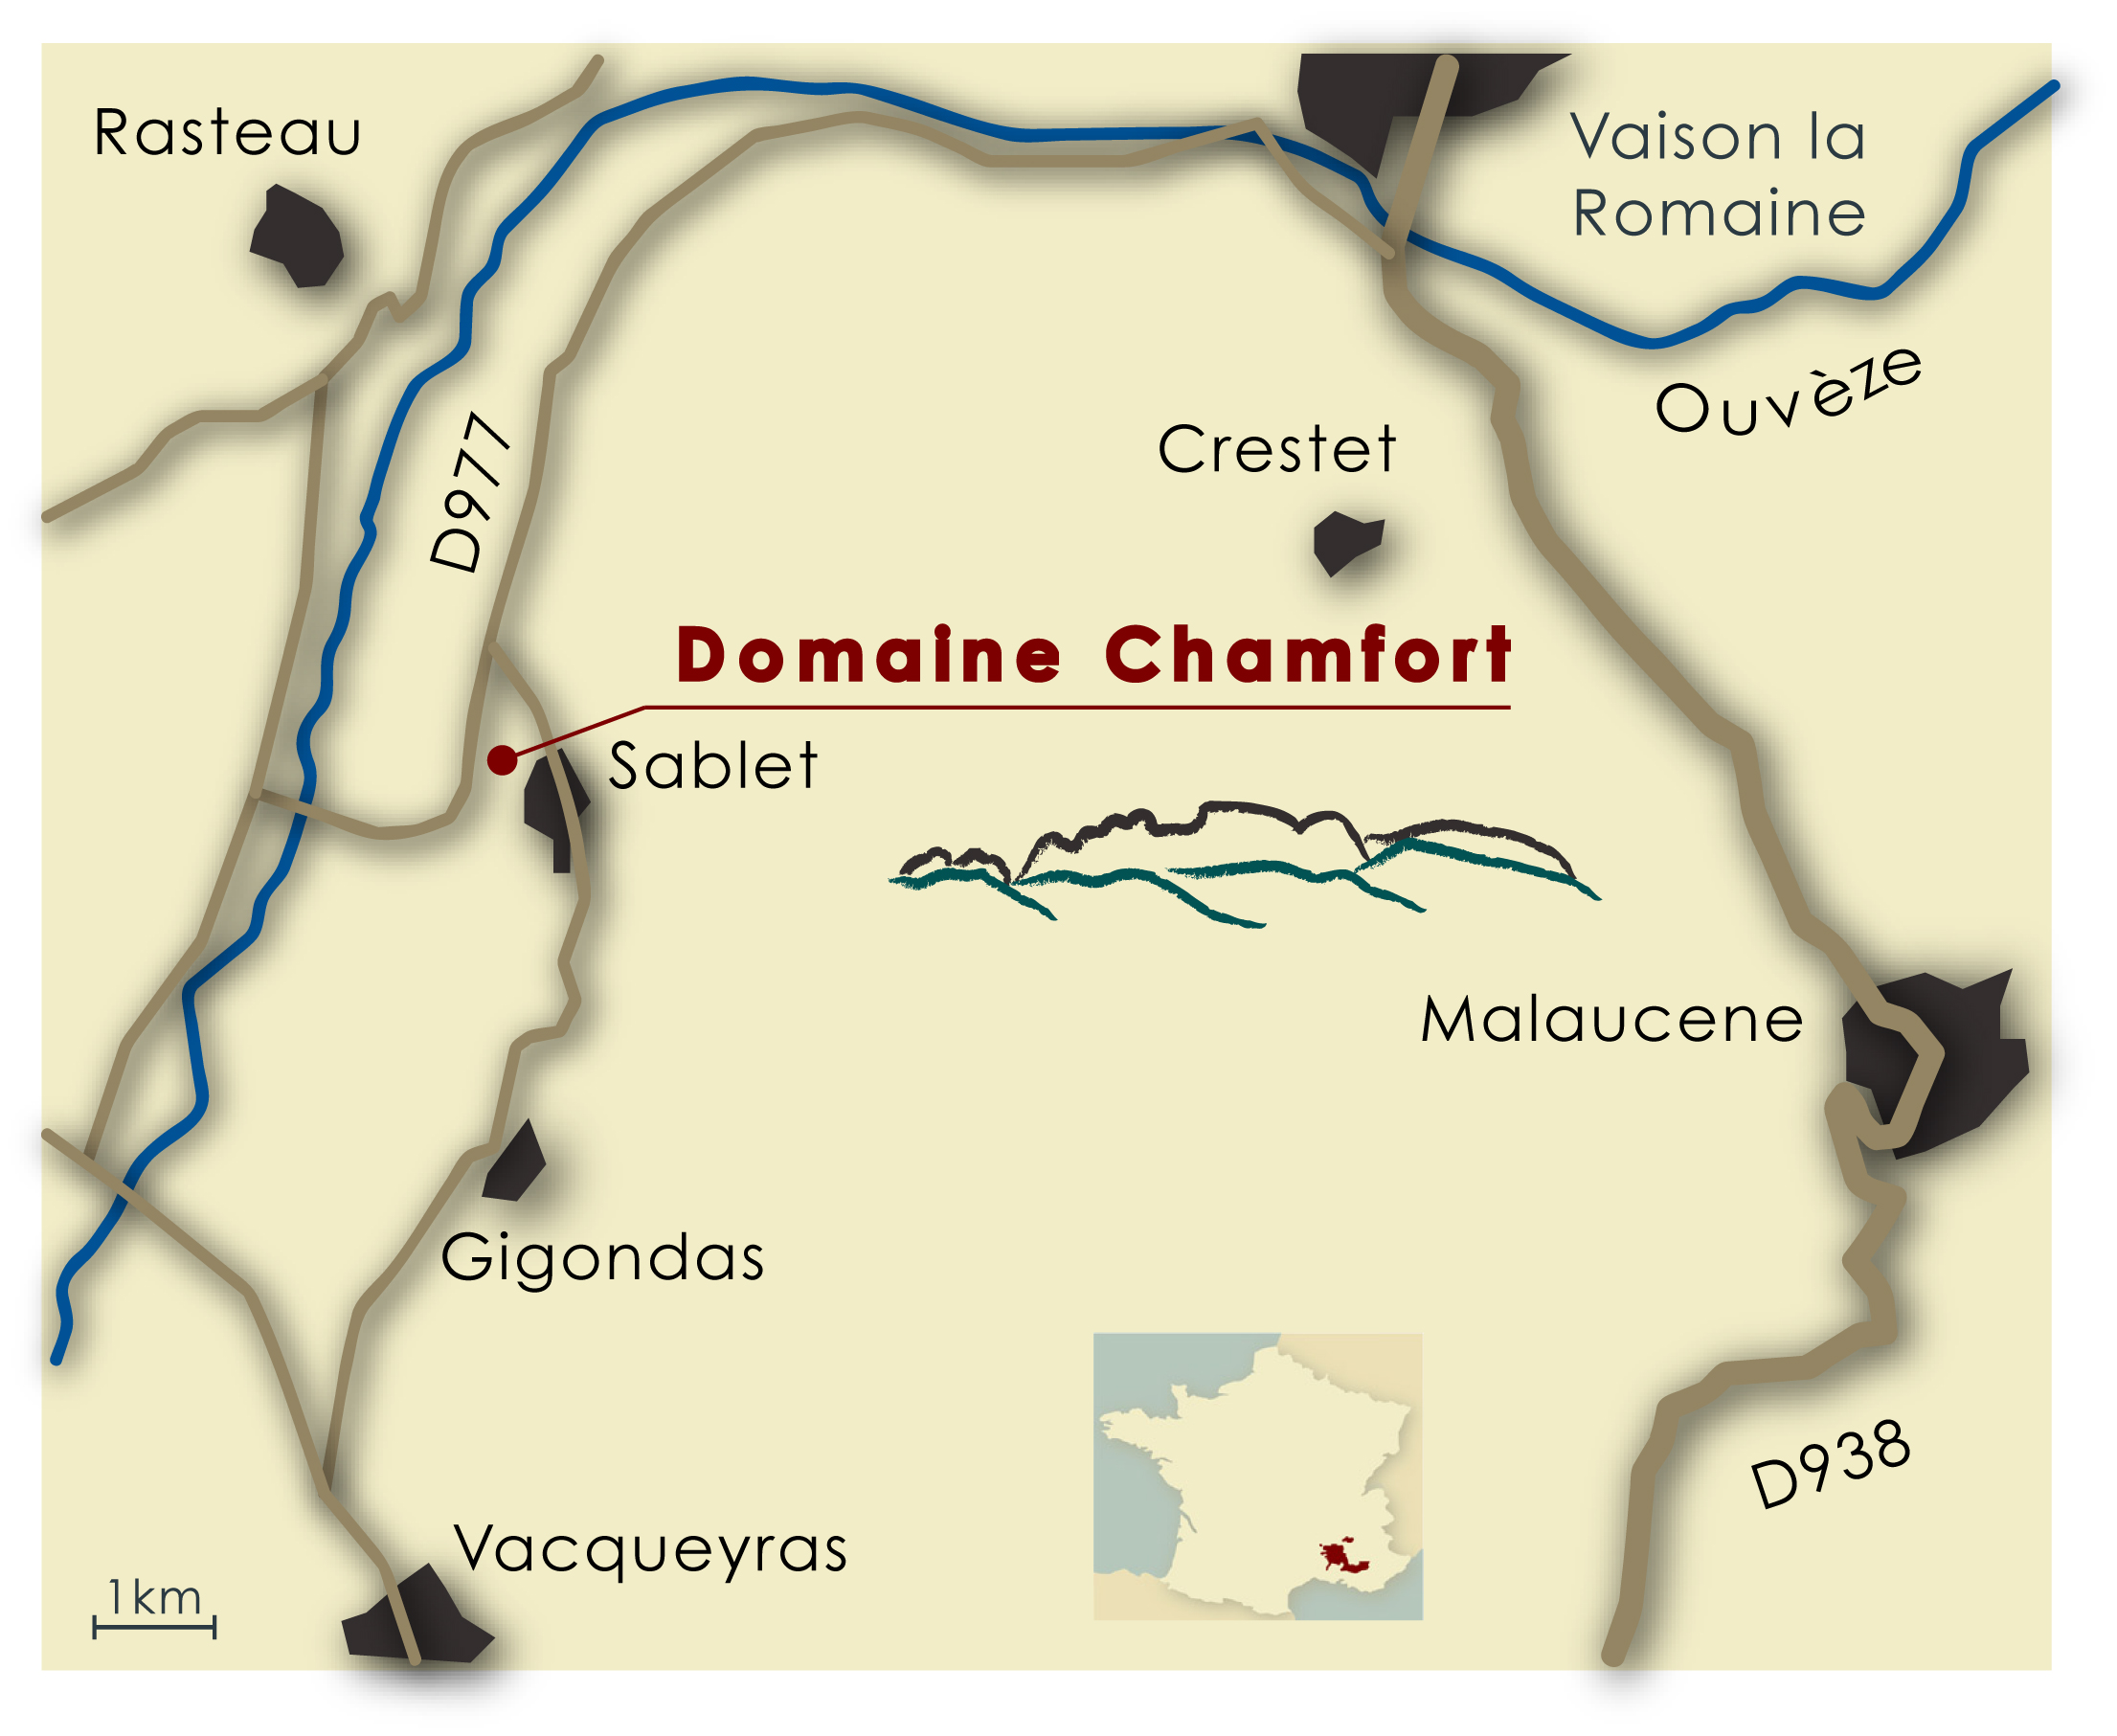 Die Domaine Chamfort in Sablet